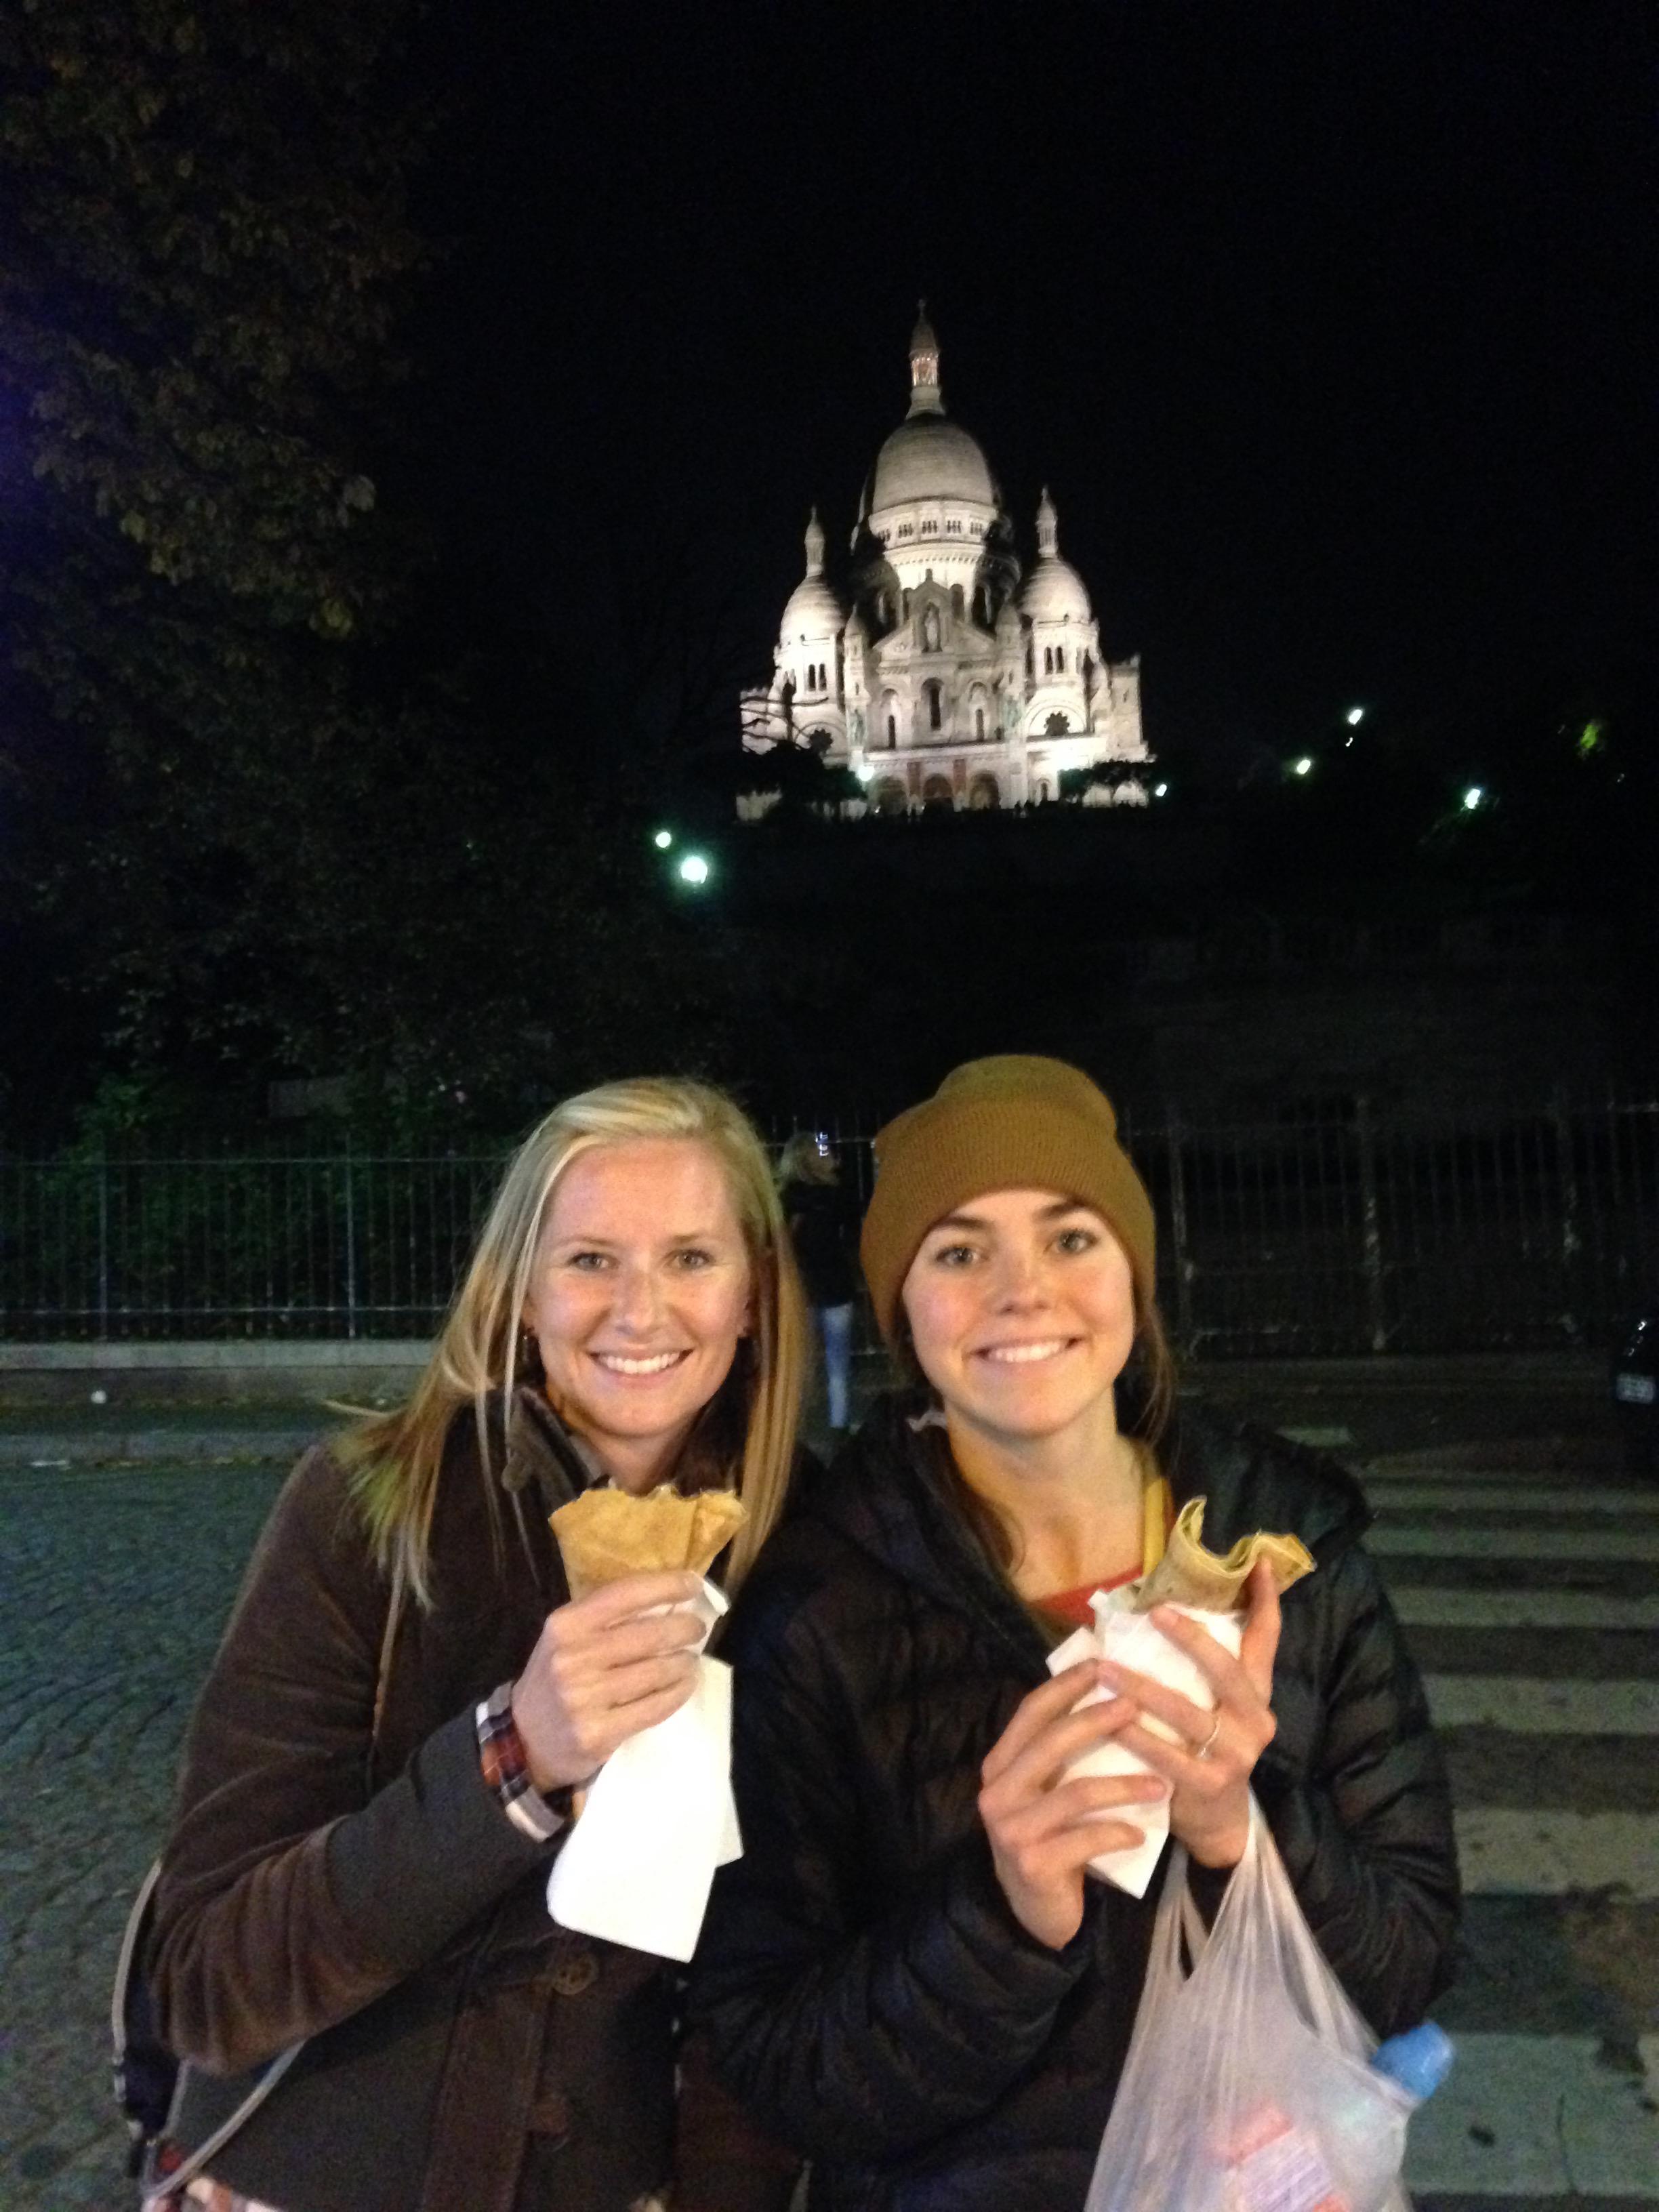 nutella crepe in Paris..... totally worth it